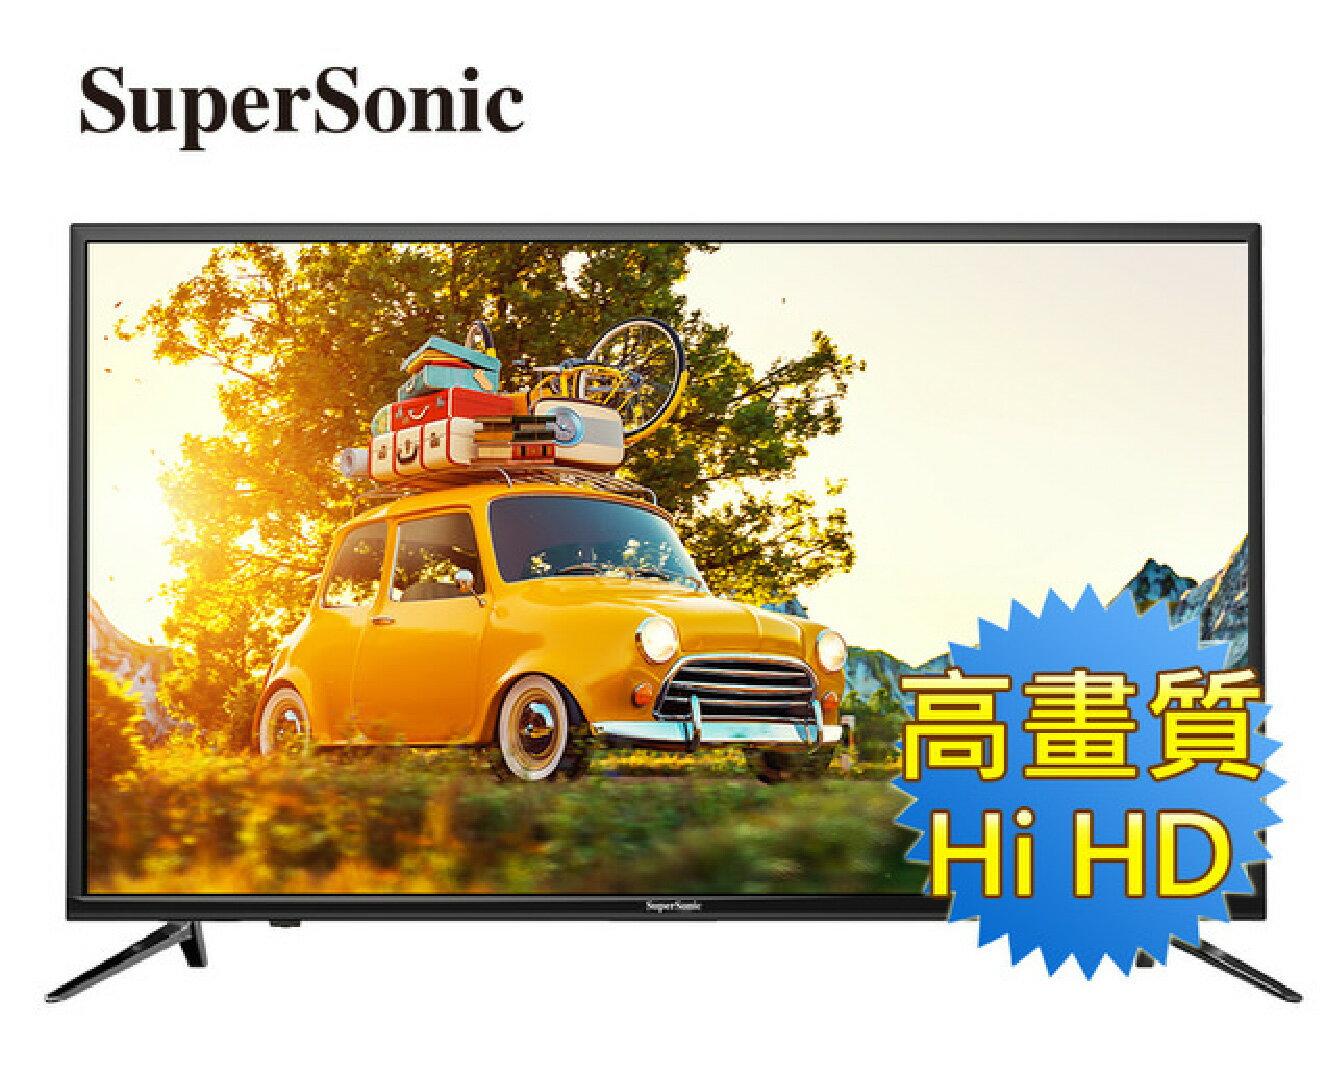 SuperSonic 32型 Hi HD LED 低藍光護眼 環保節能 (32SP-DC1) 液晶顯示器 不含安裝 [分期零利率]